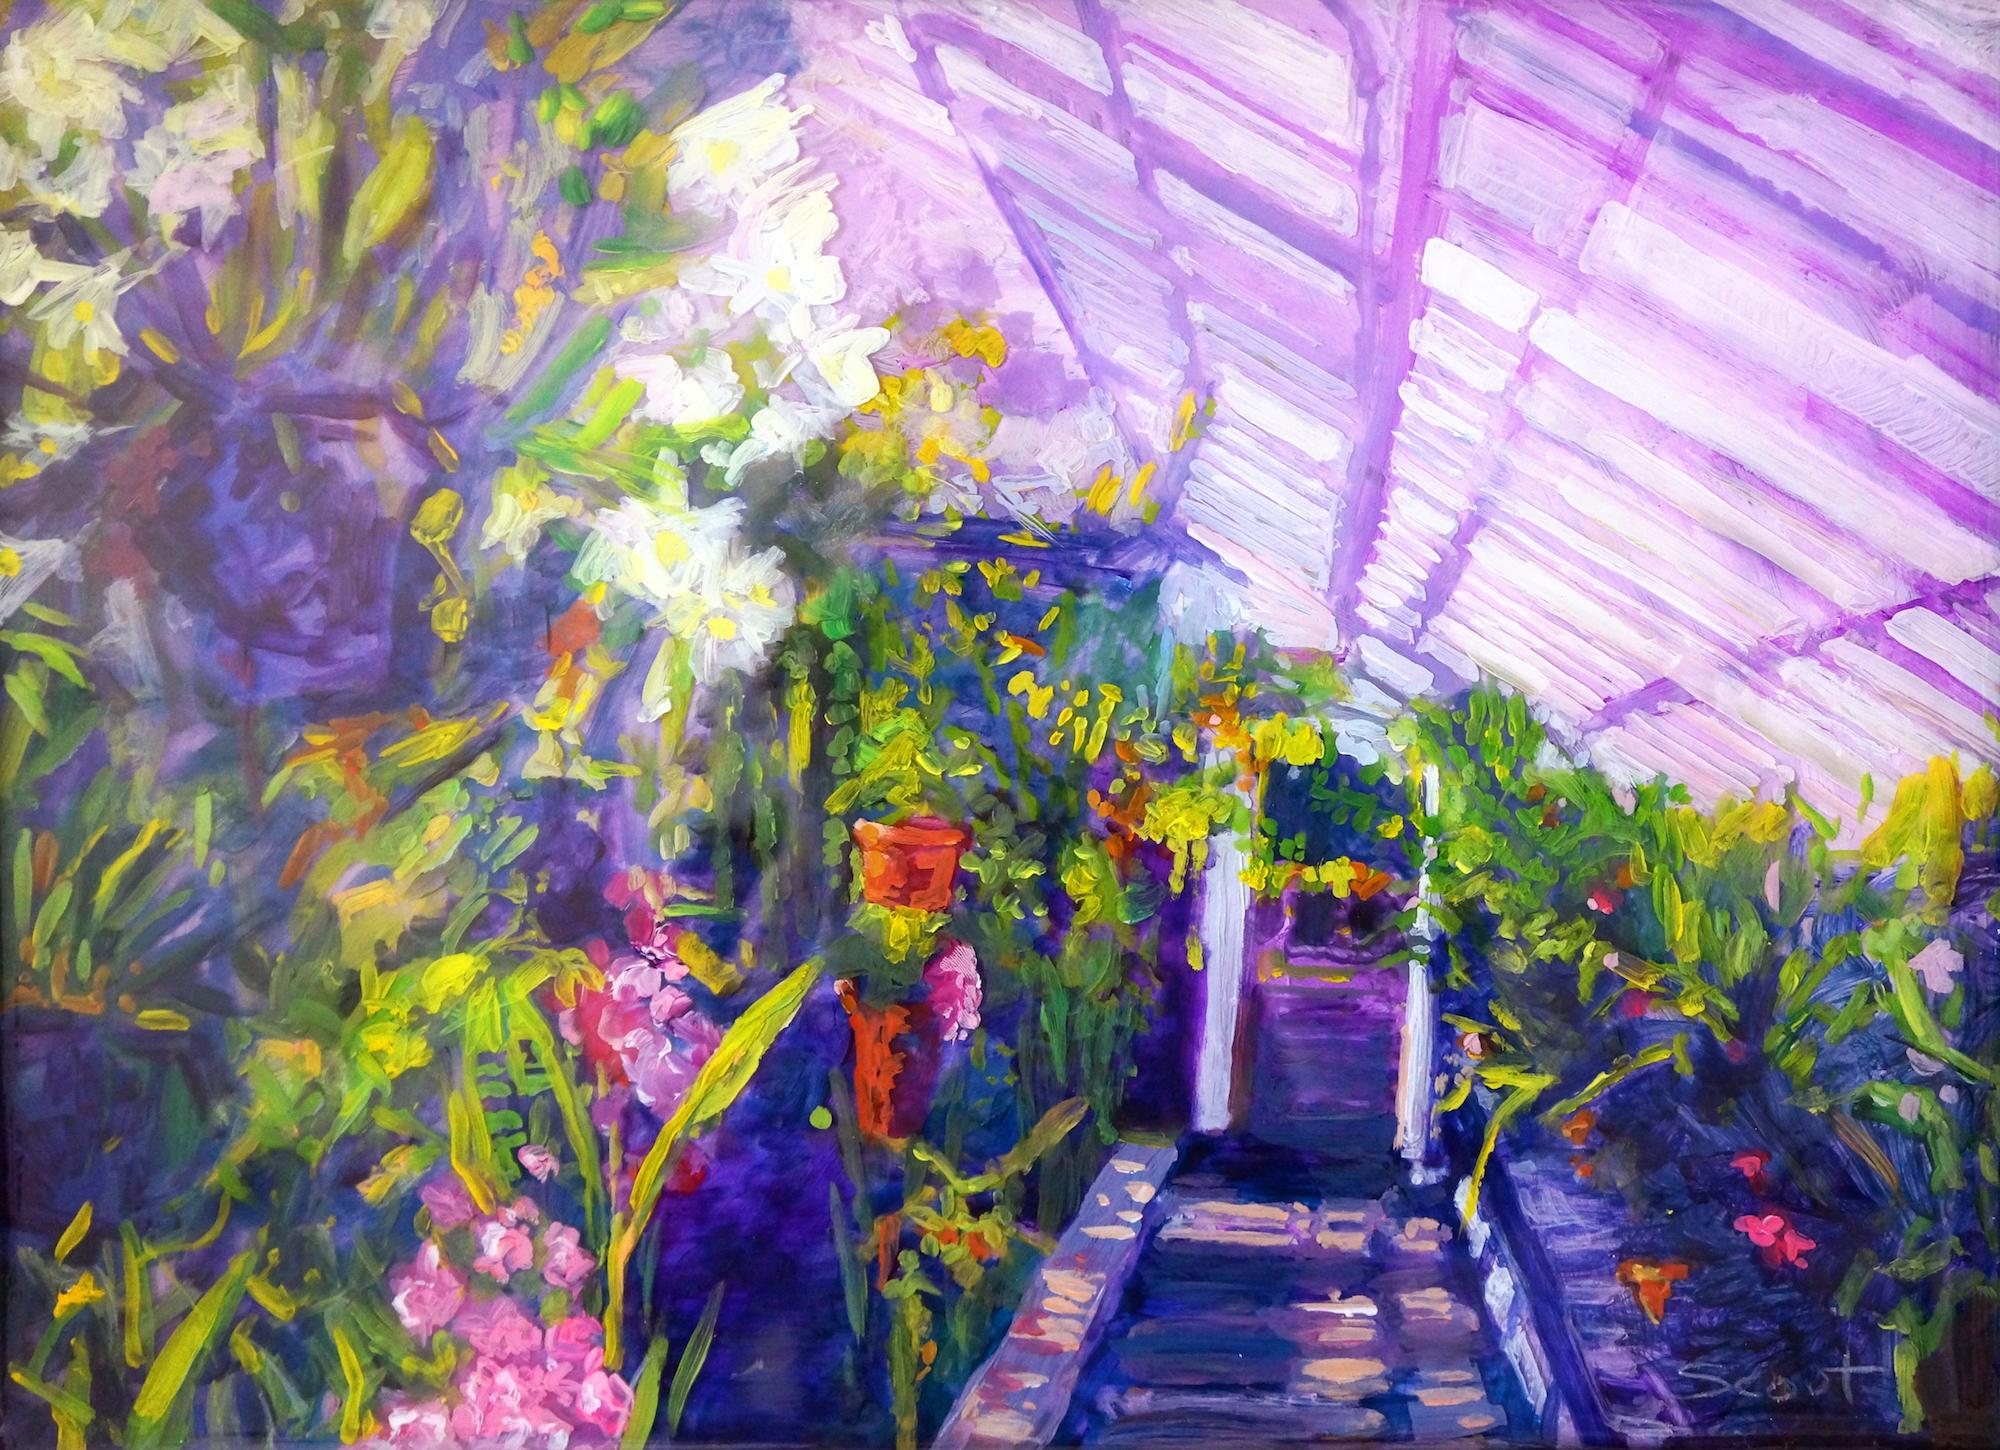 greenhouse2 12 x 16 copy.jpg